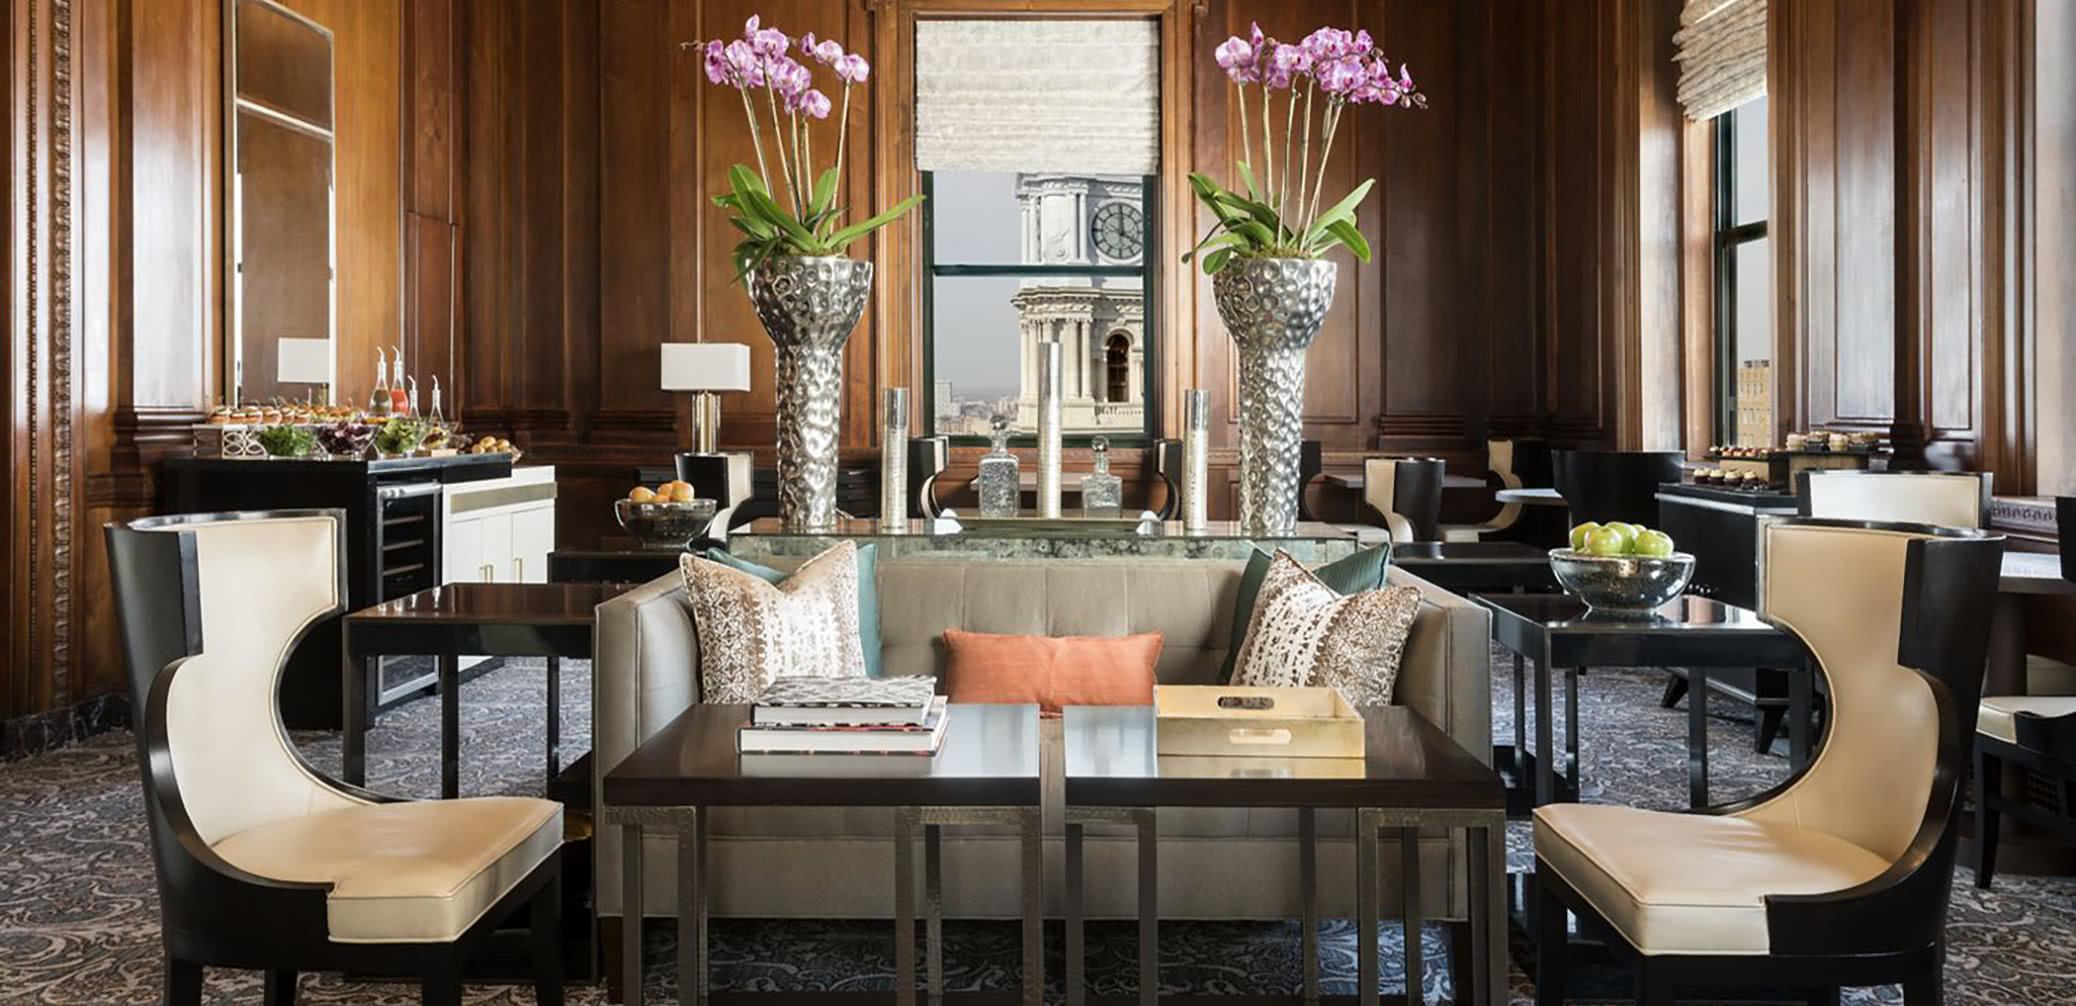 Best Hotel Executive Club Lounges In Philadelphia, Pennsylvania